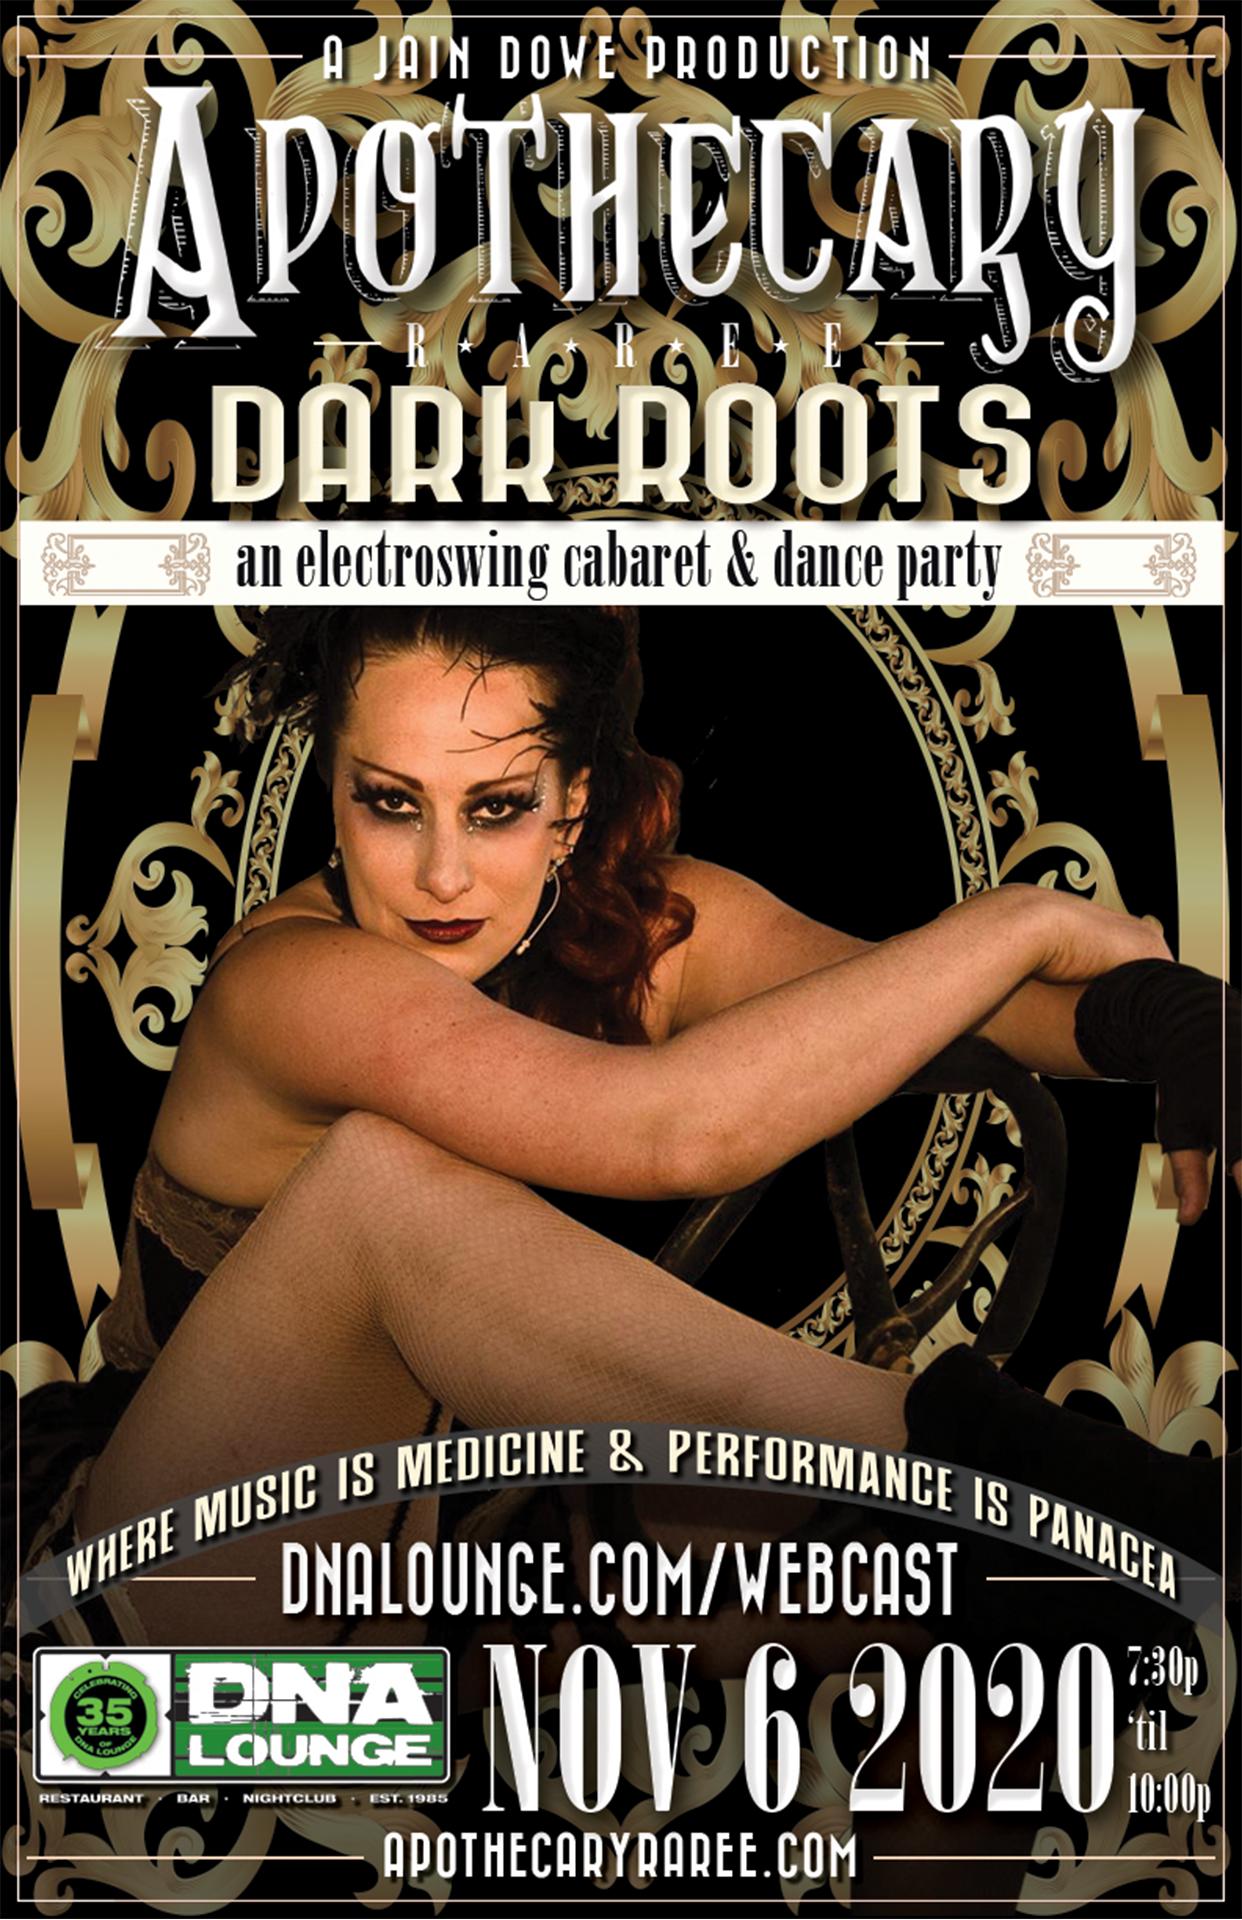 Apothecary Raree: Dark Roots - Friday, November 6, 2020, 7:30-10pm - dnalounge.com